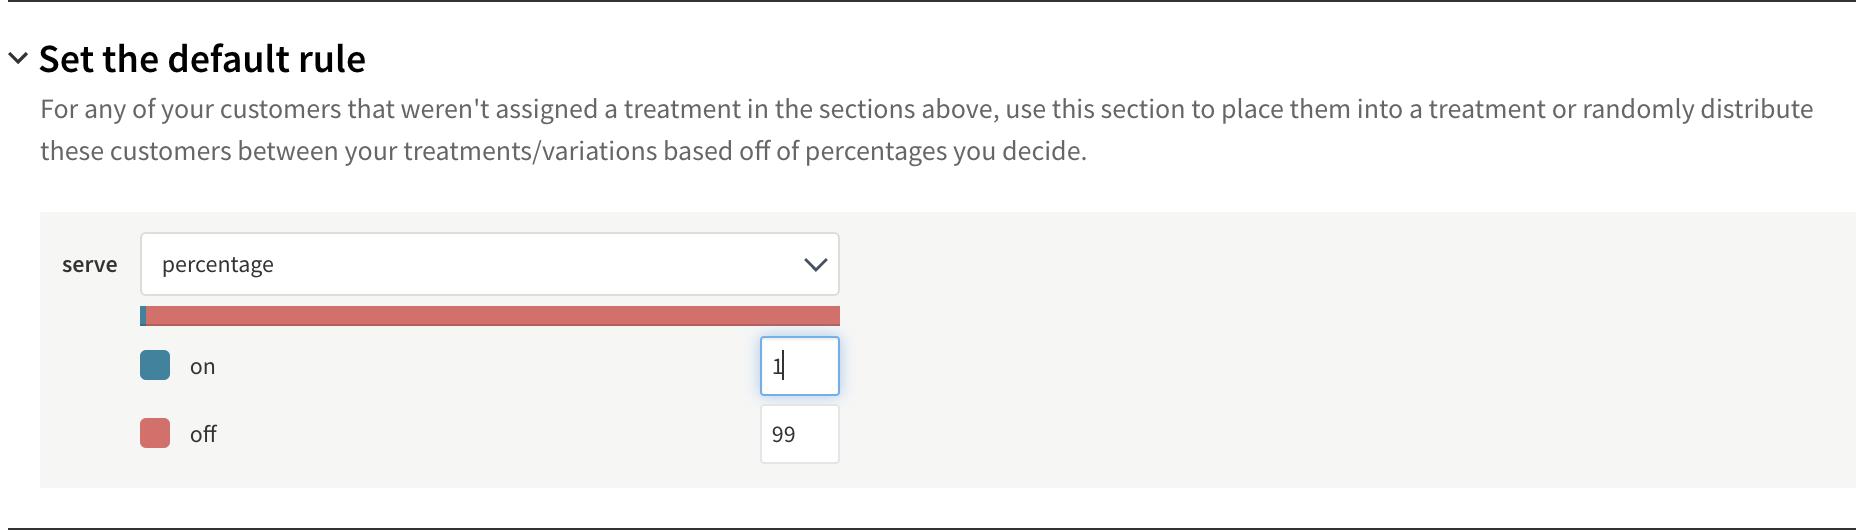 Set default